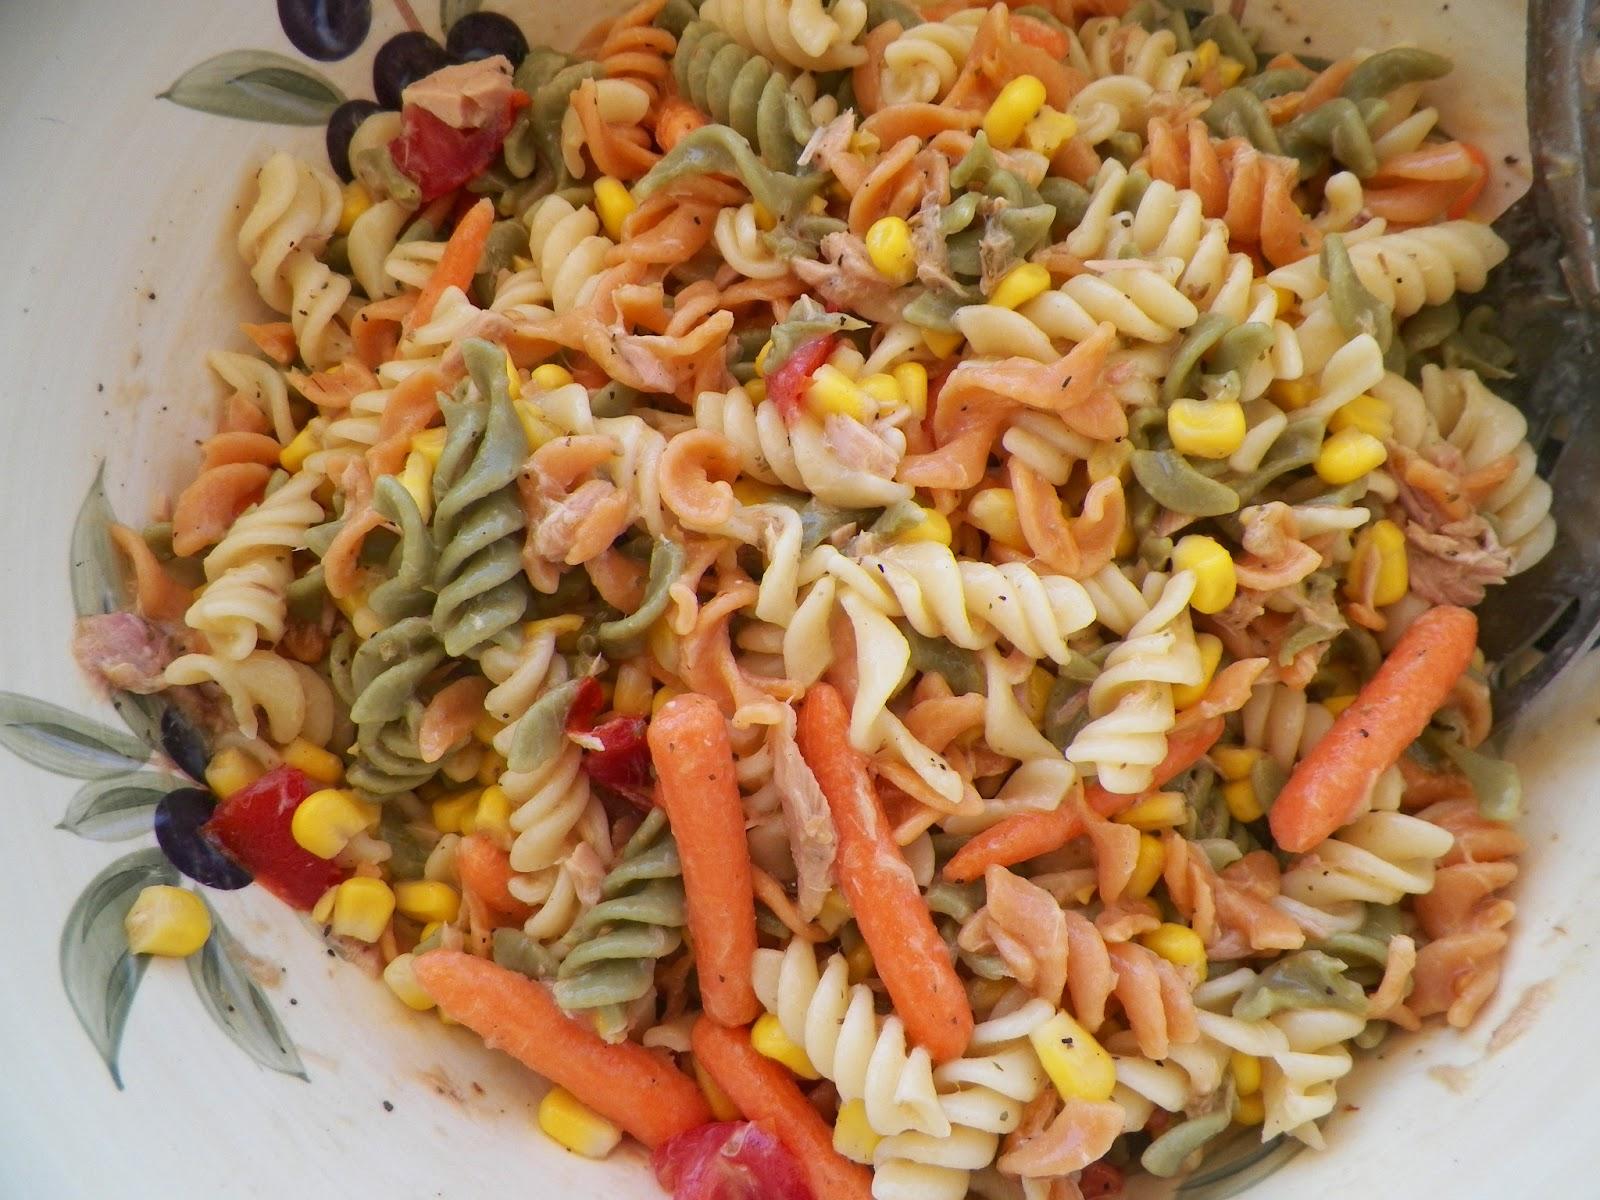 pasta salad with tuna, carrots and corn